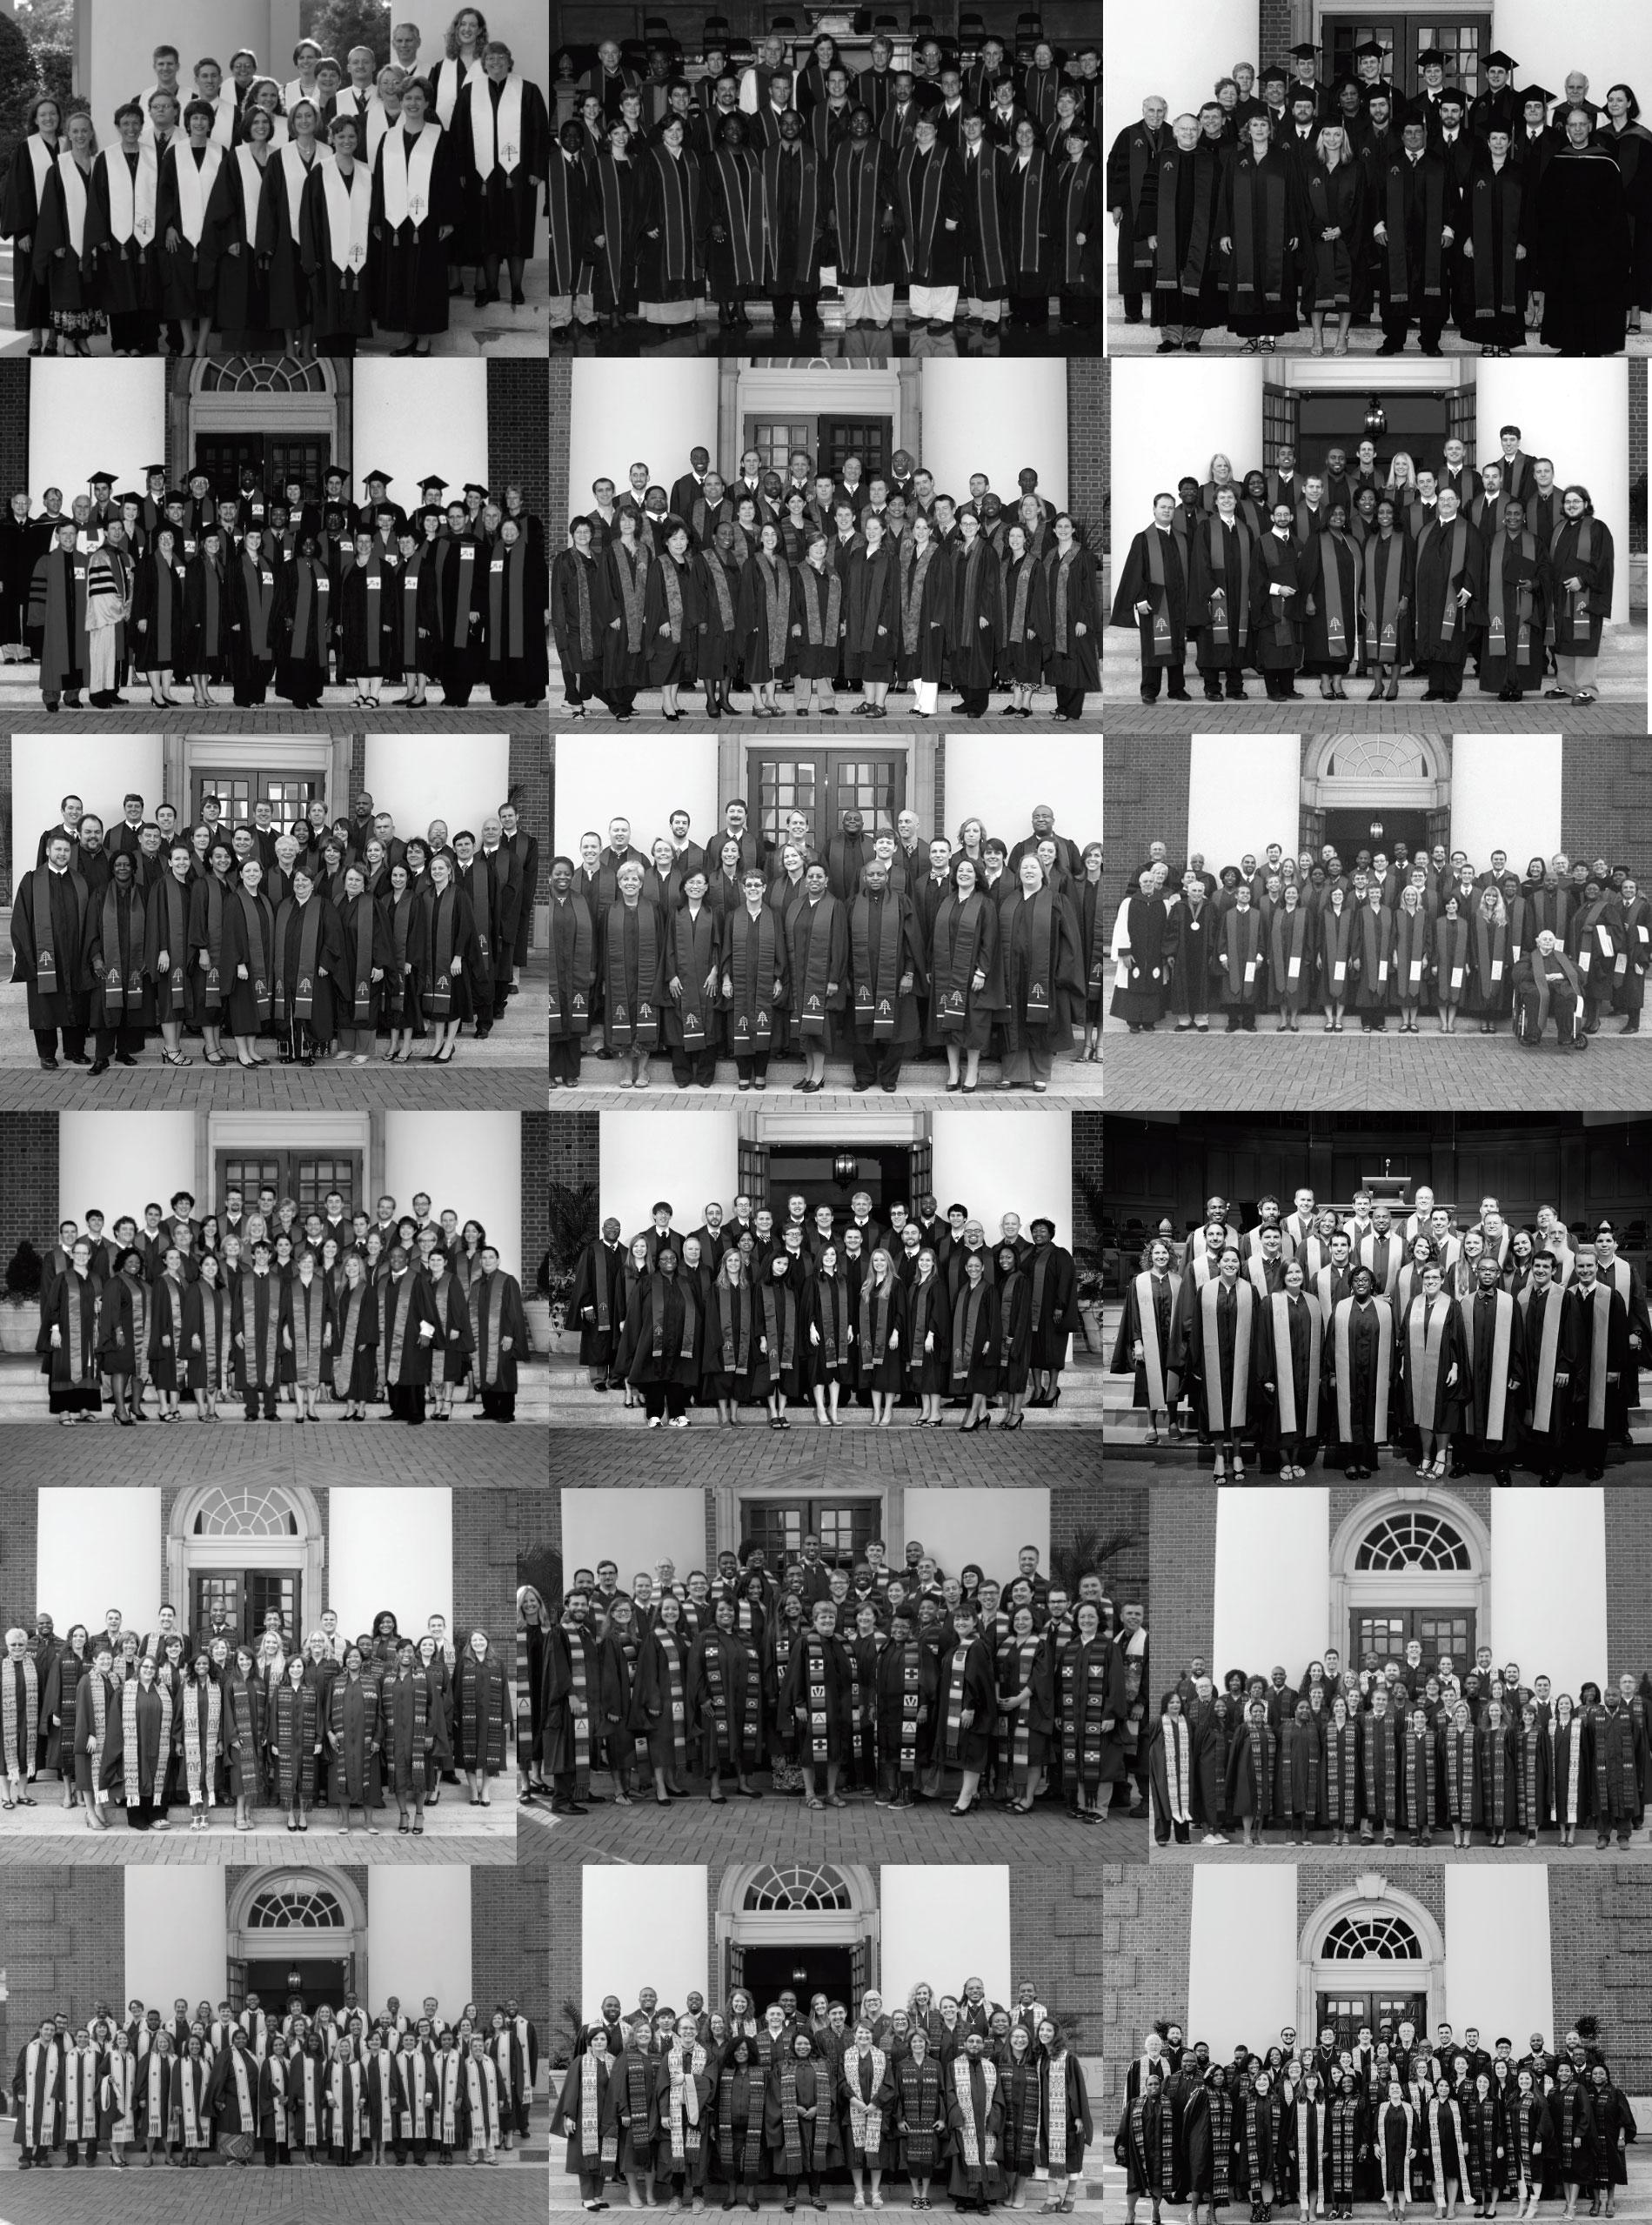 Master of Divinity Graduates, 2002 - 2019